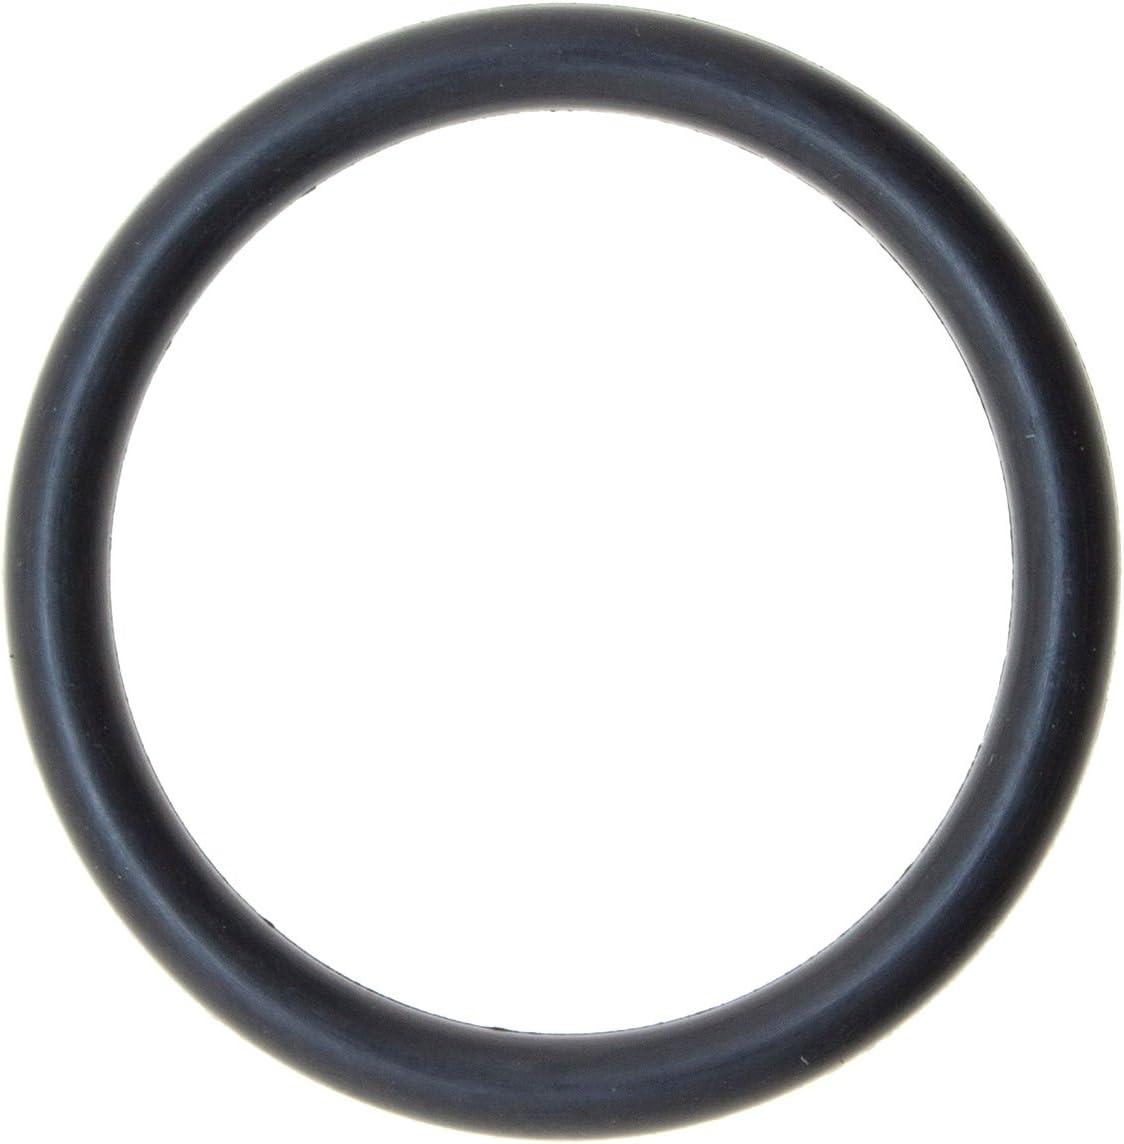 10 Stück O-Ring O-Ringe 29 x 3 mm DIN 3601 Viton FPM FKM 75 Neu